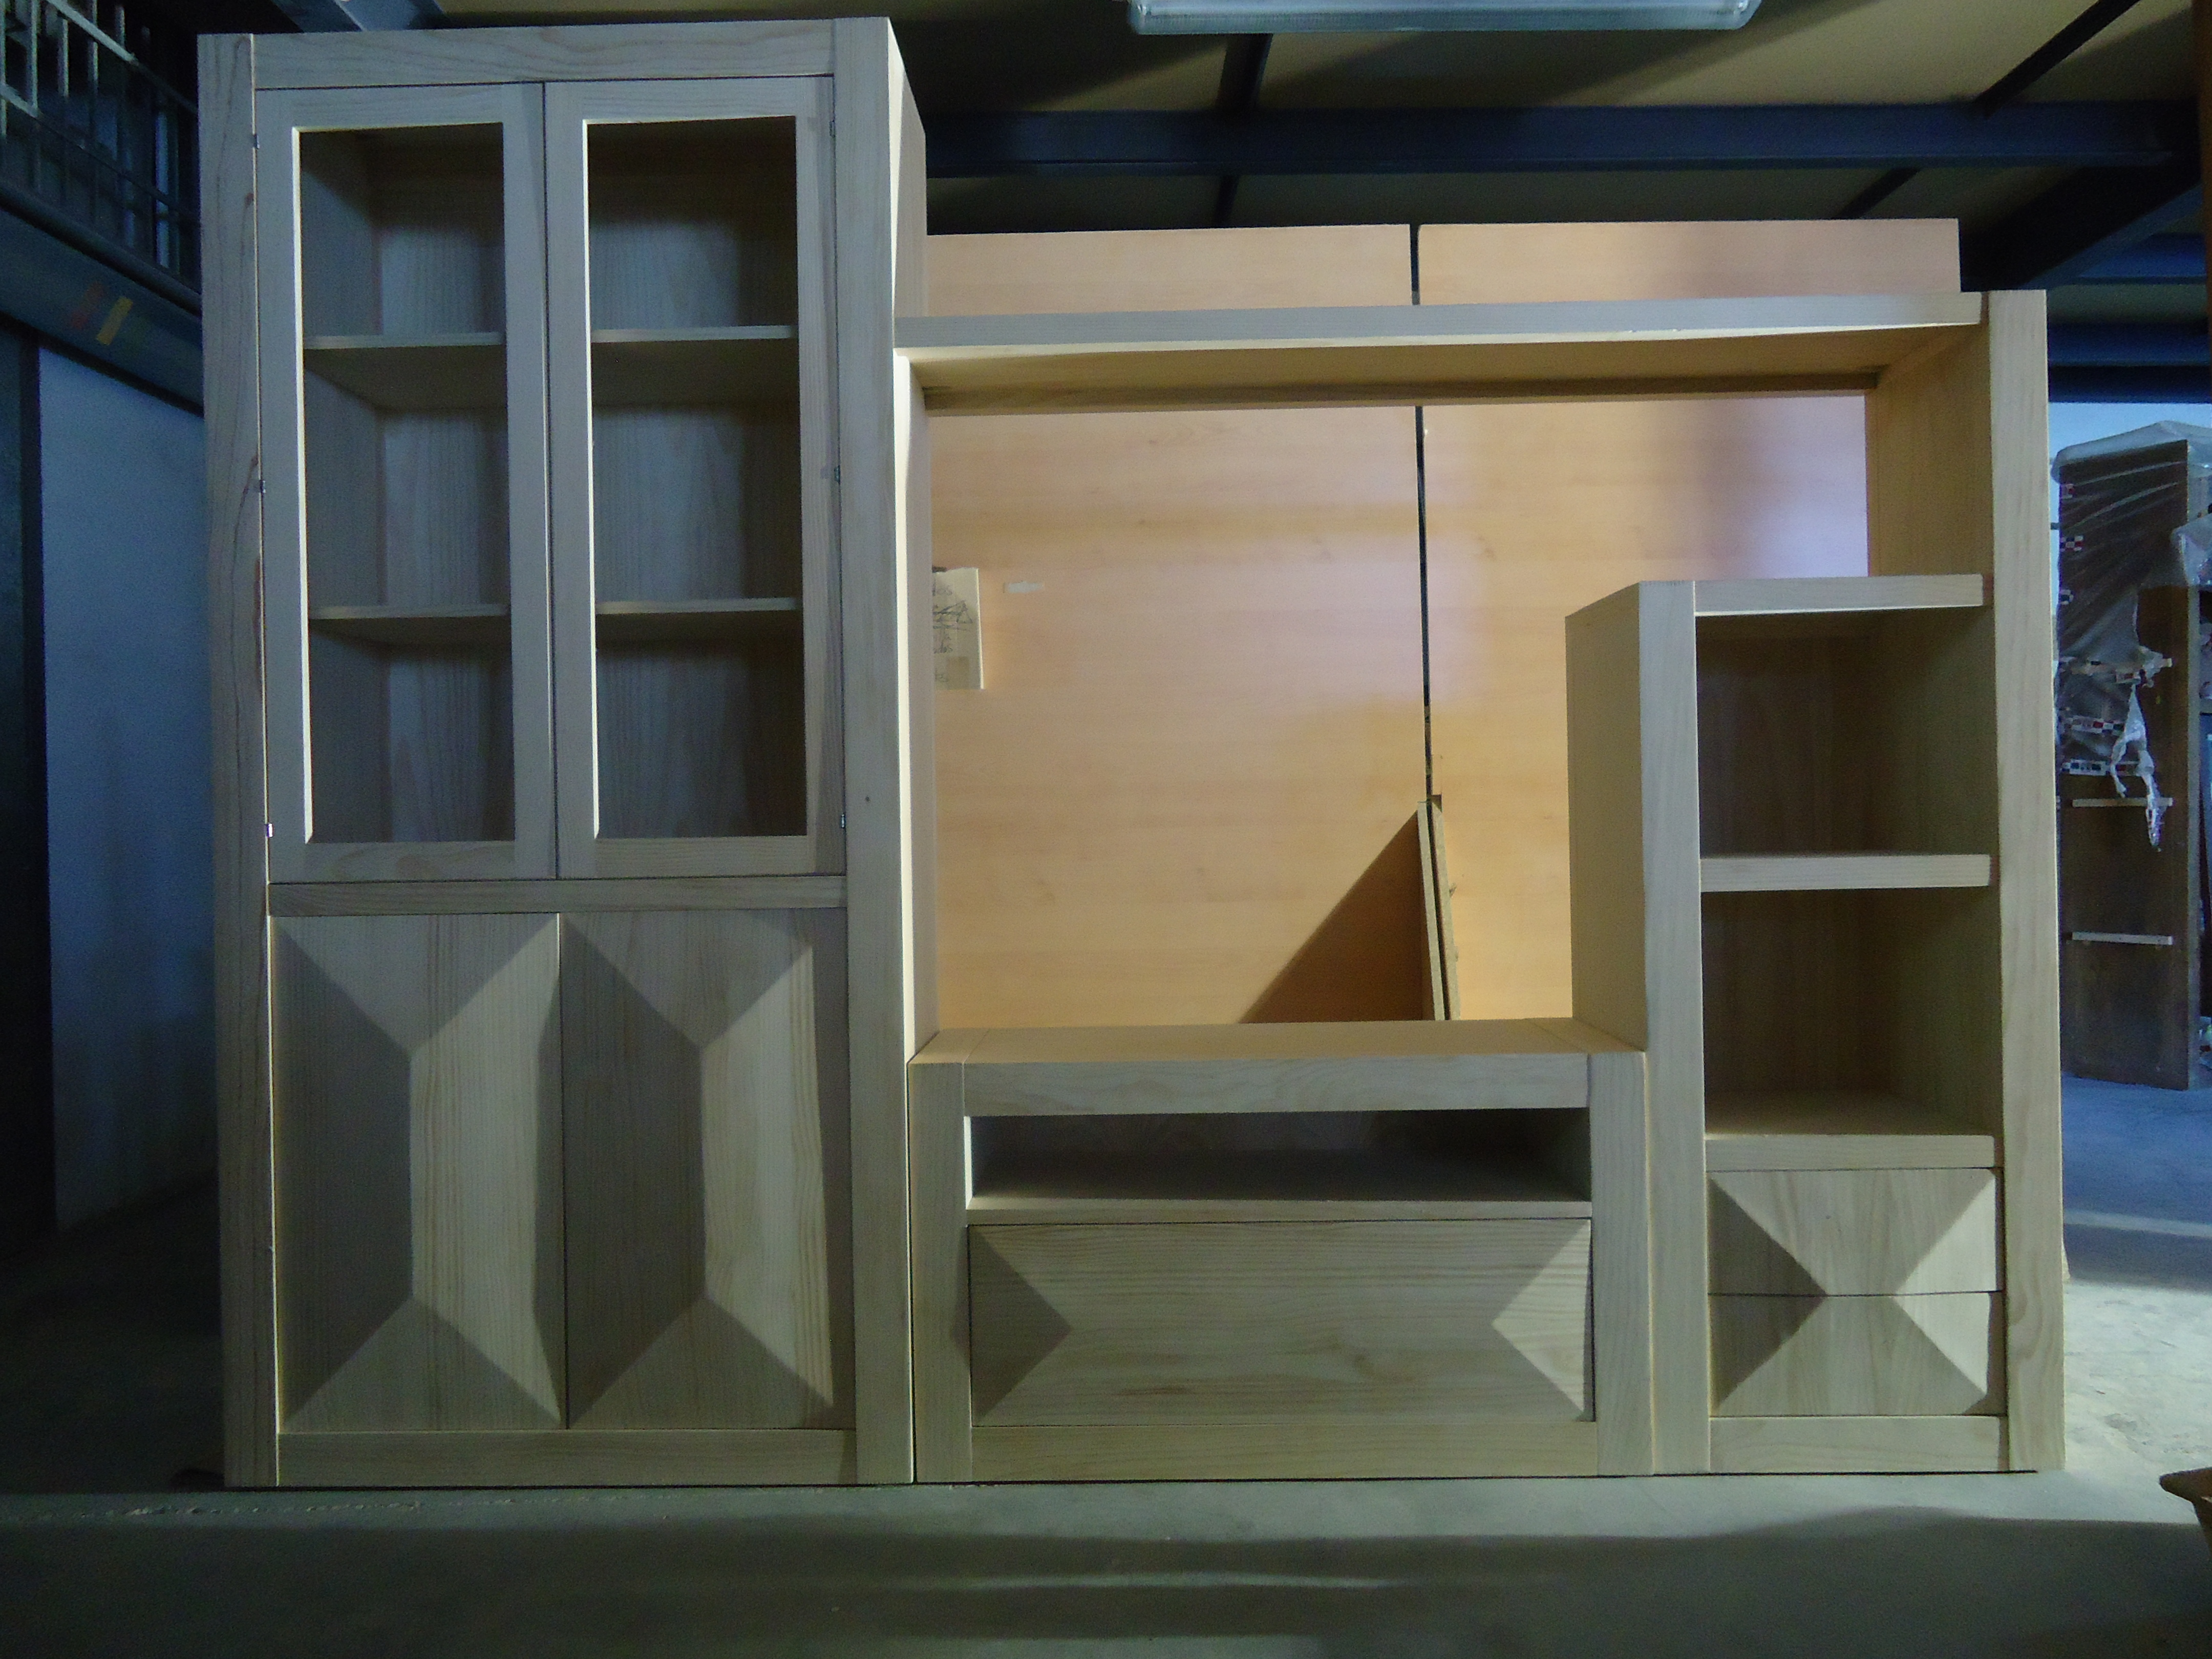 Muebles En Crudo Hogares Muebles # Muebles En Crudo